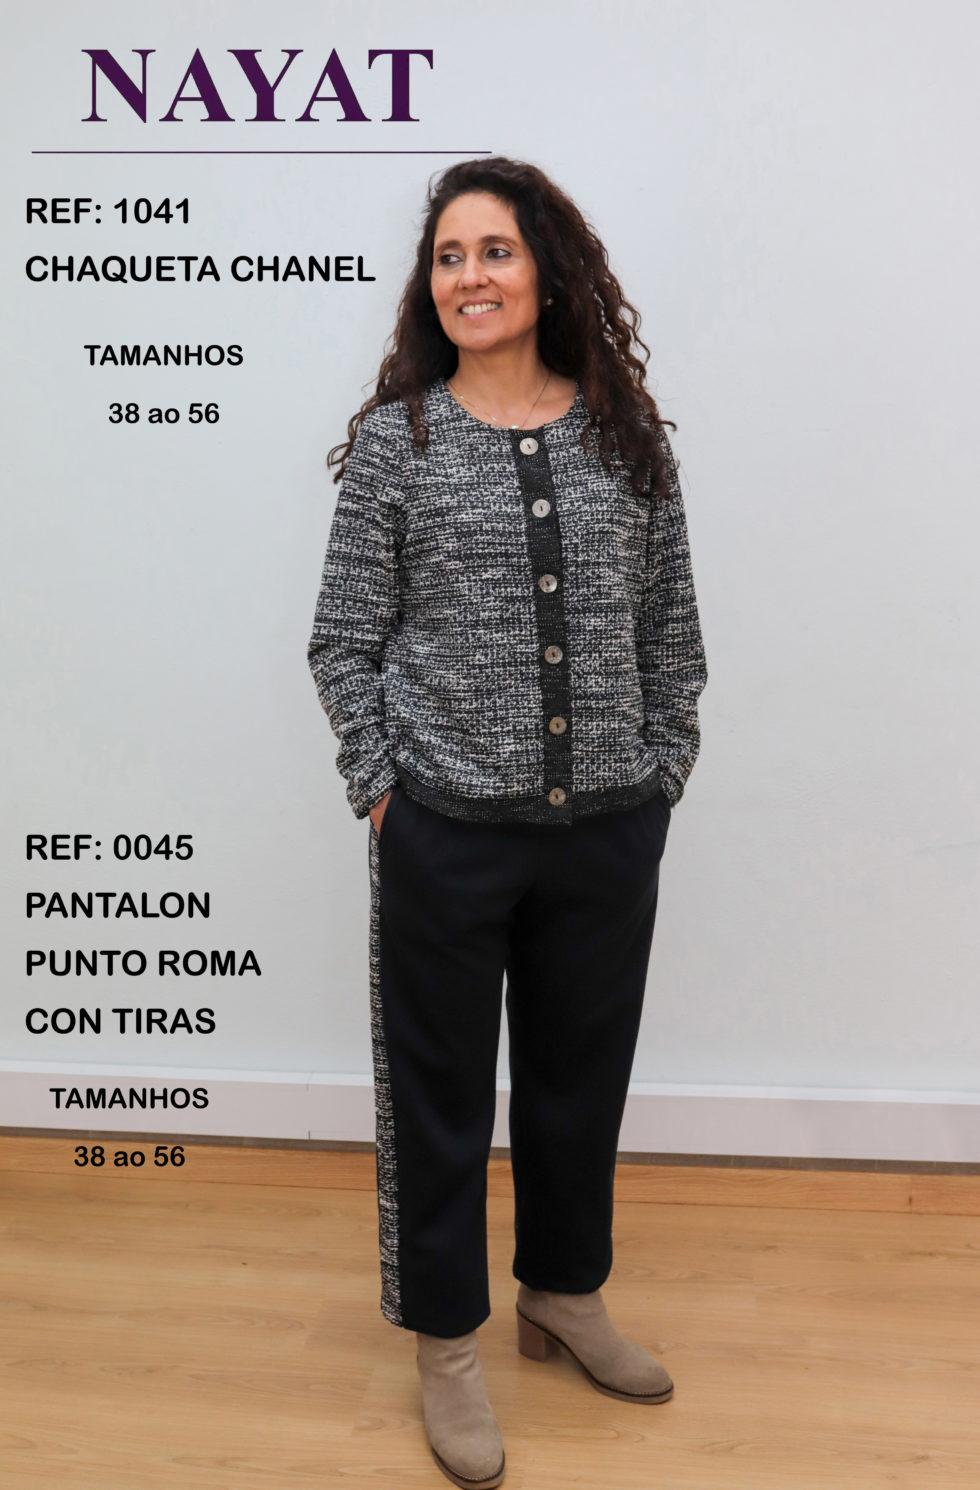 1041 + CALÇA 0045